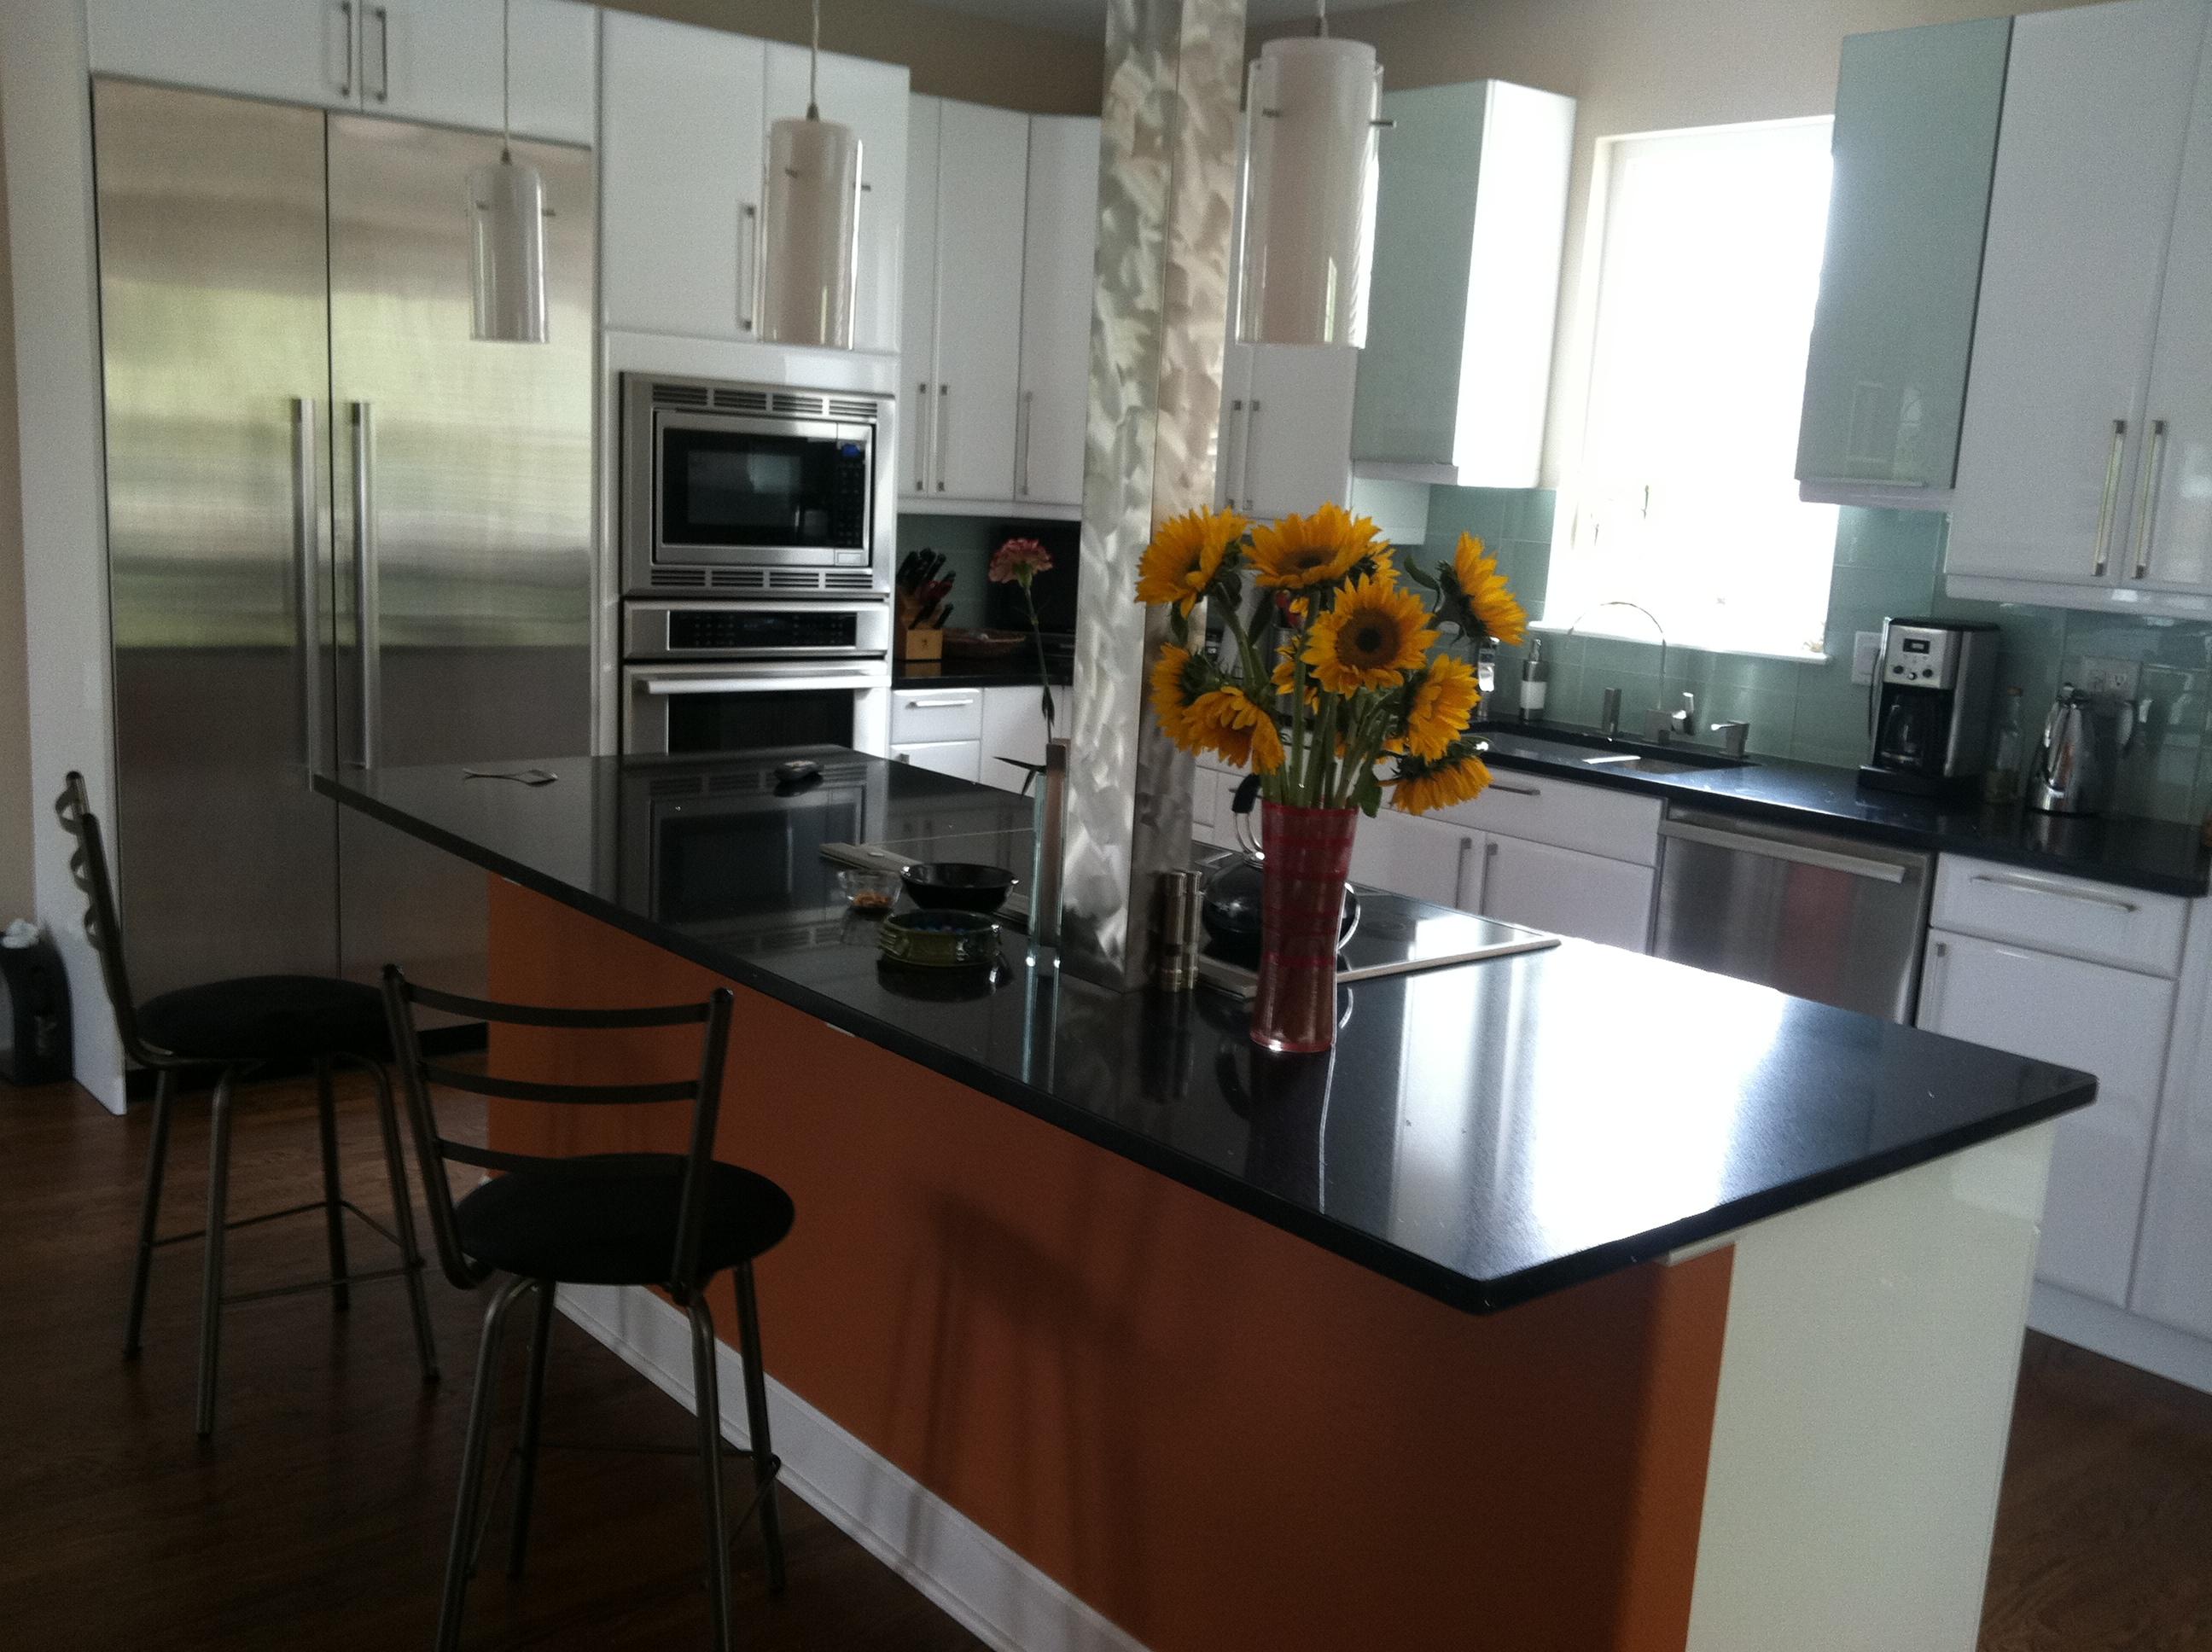 residential kitchen remodeling lincoln ne Tank Home Addition Kitchen Remodel Denver CO